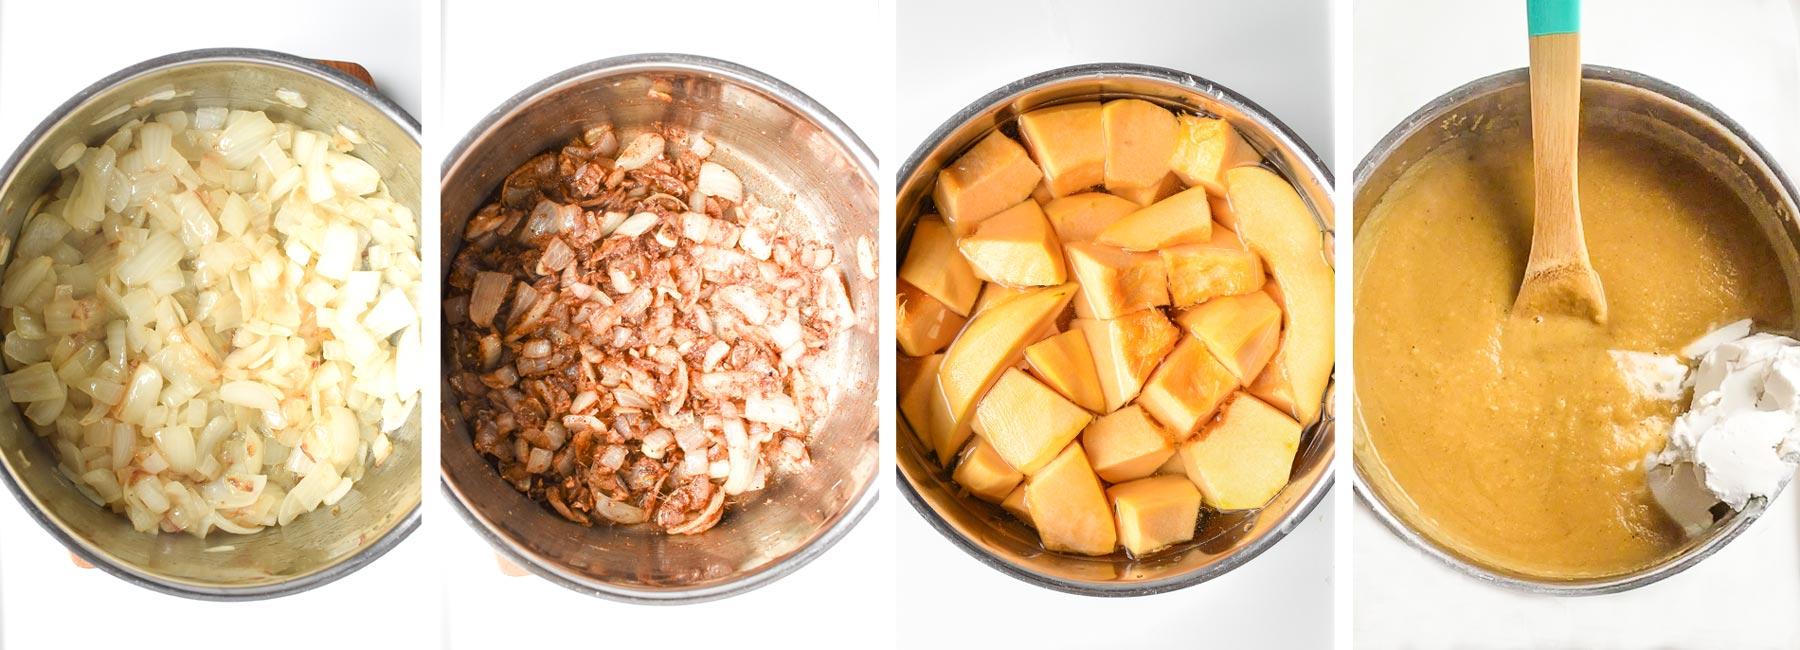 Cozy Squash Soup Recipe Process